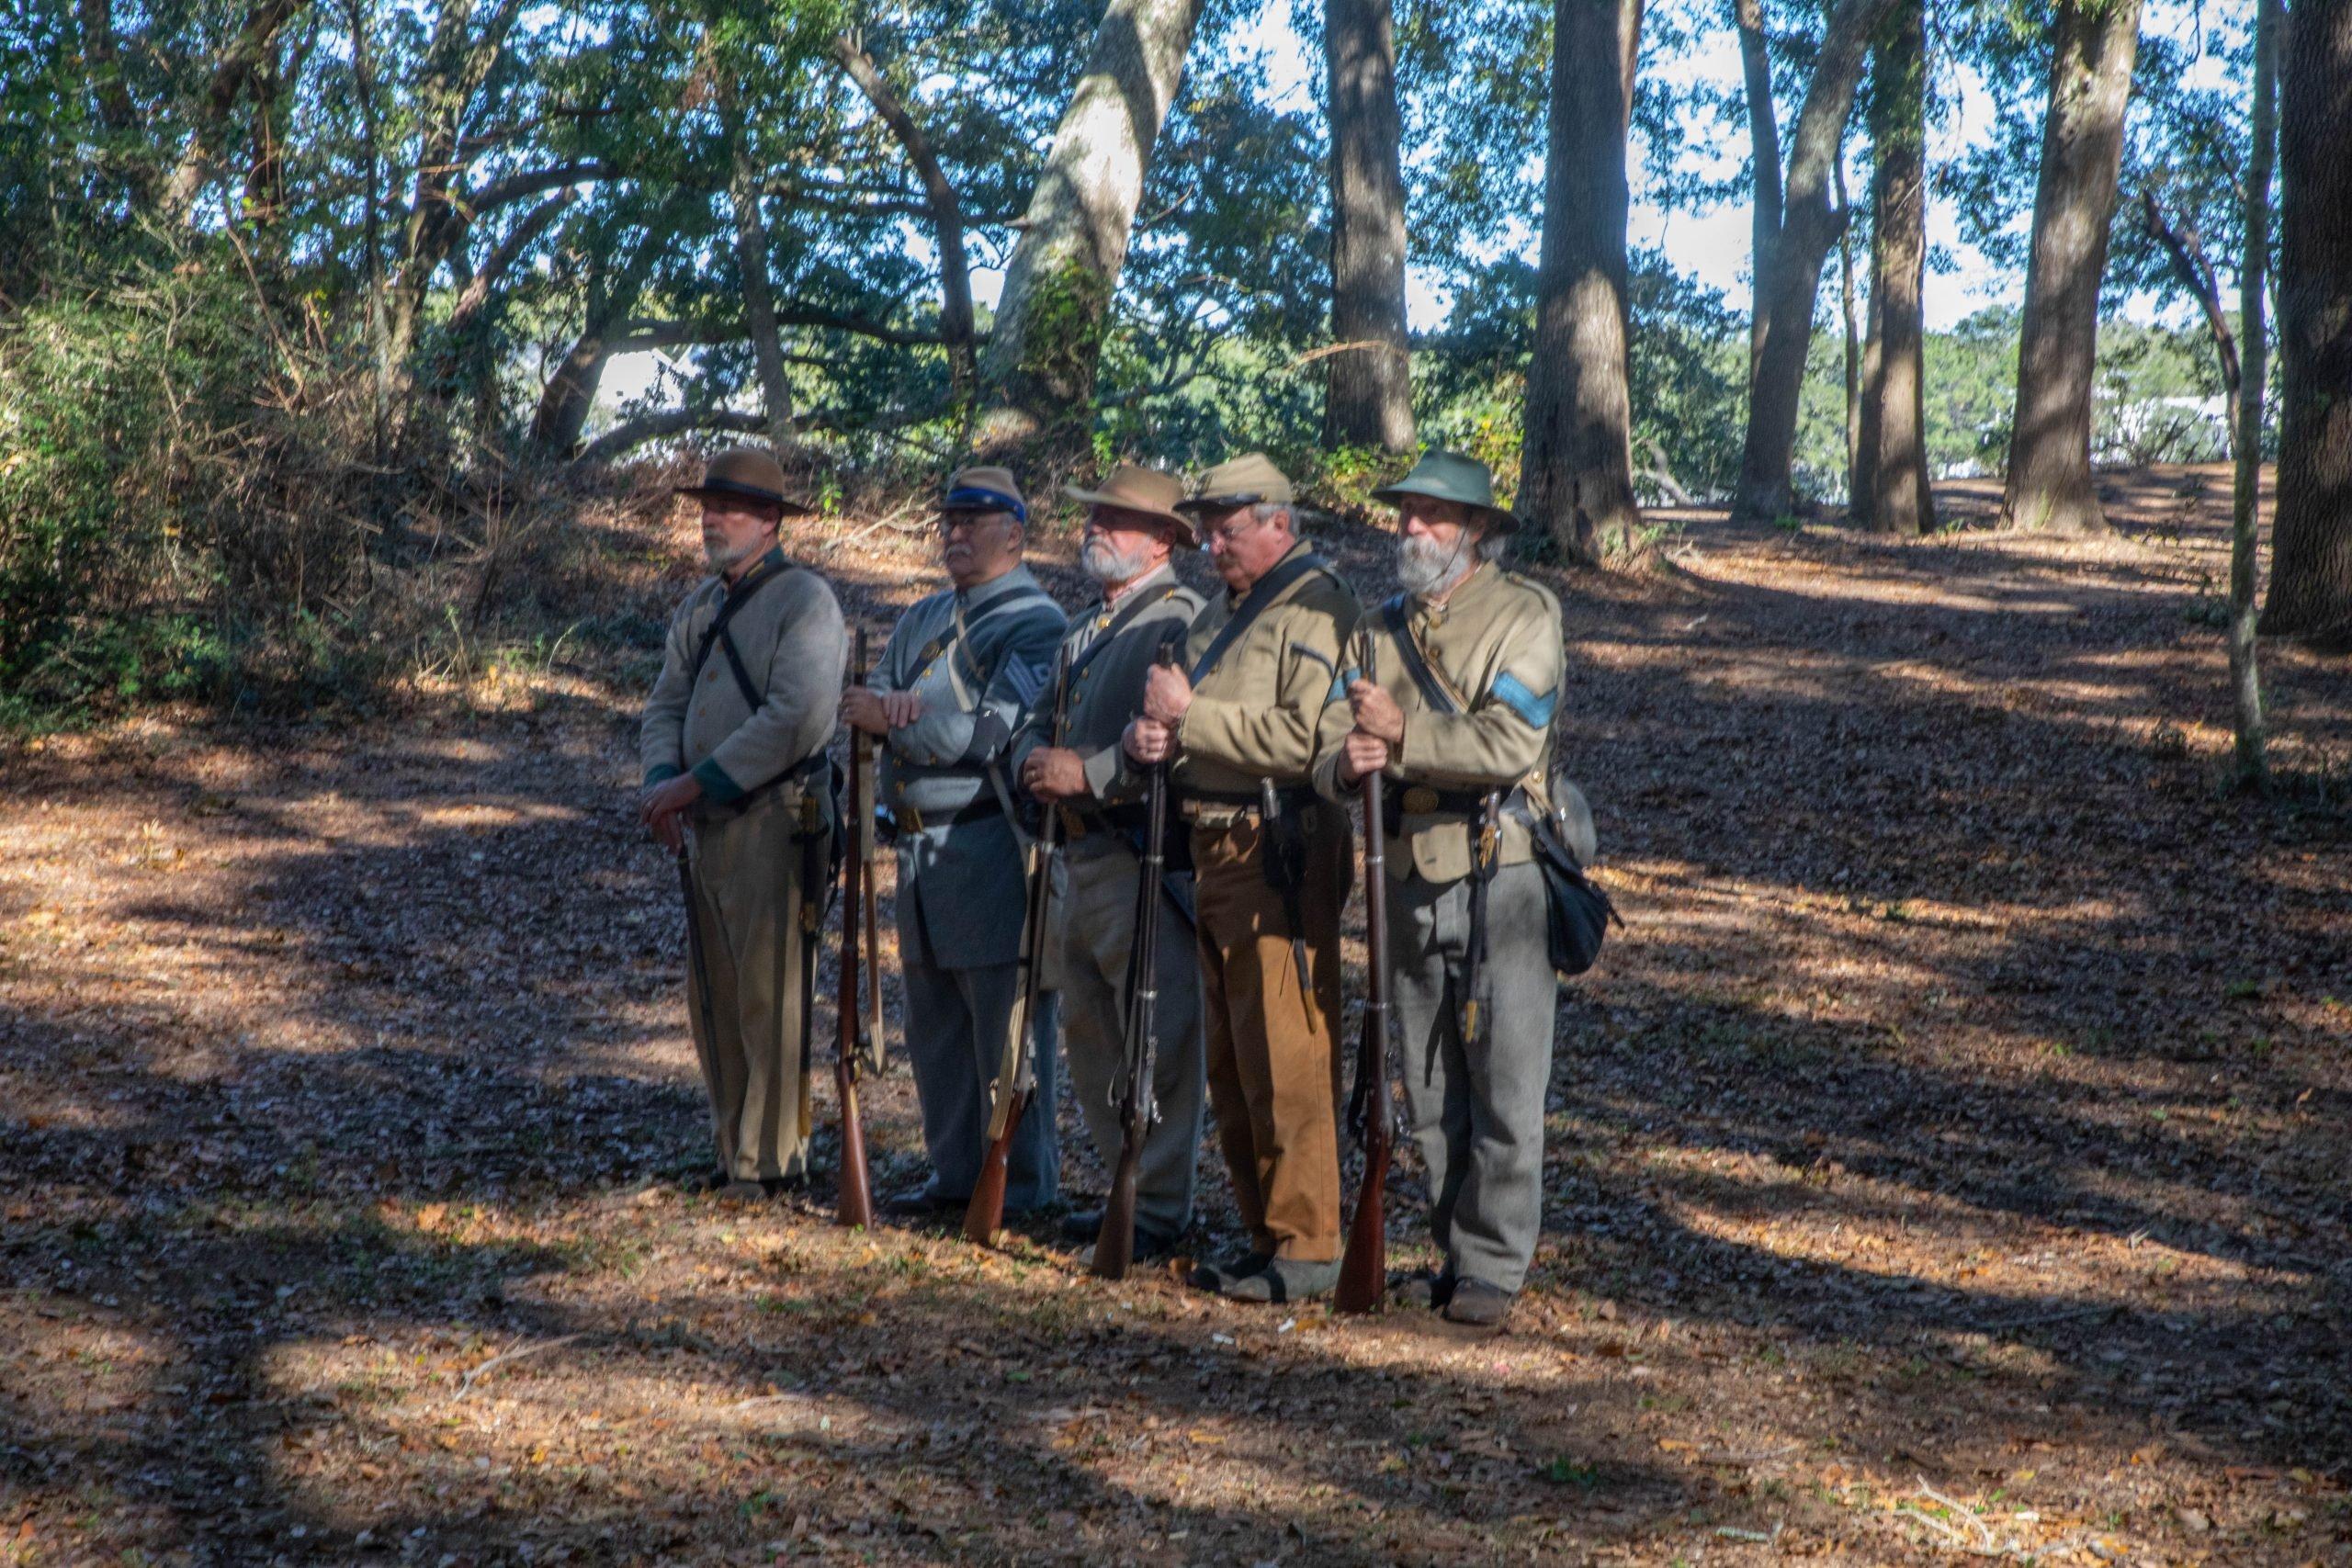 Sons of Confederate Veterans C.S.A. South Carolina 15